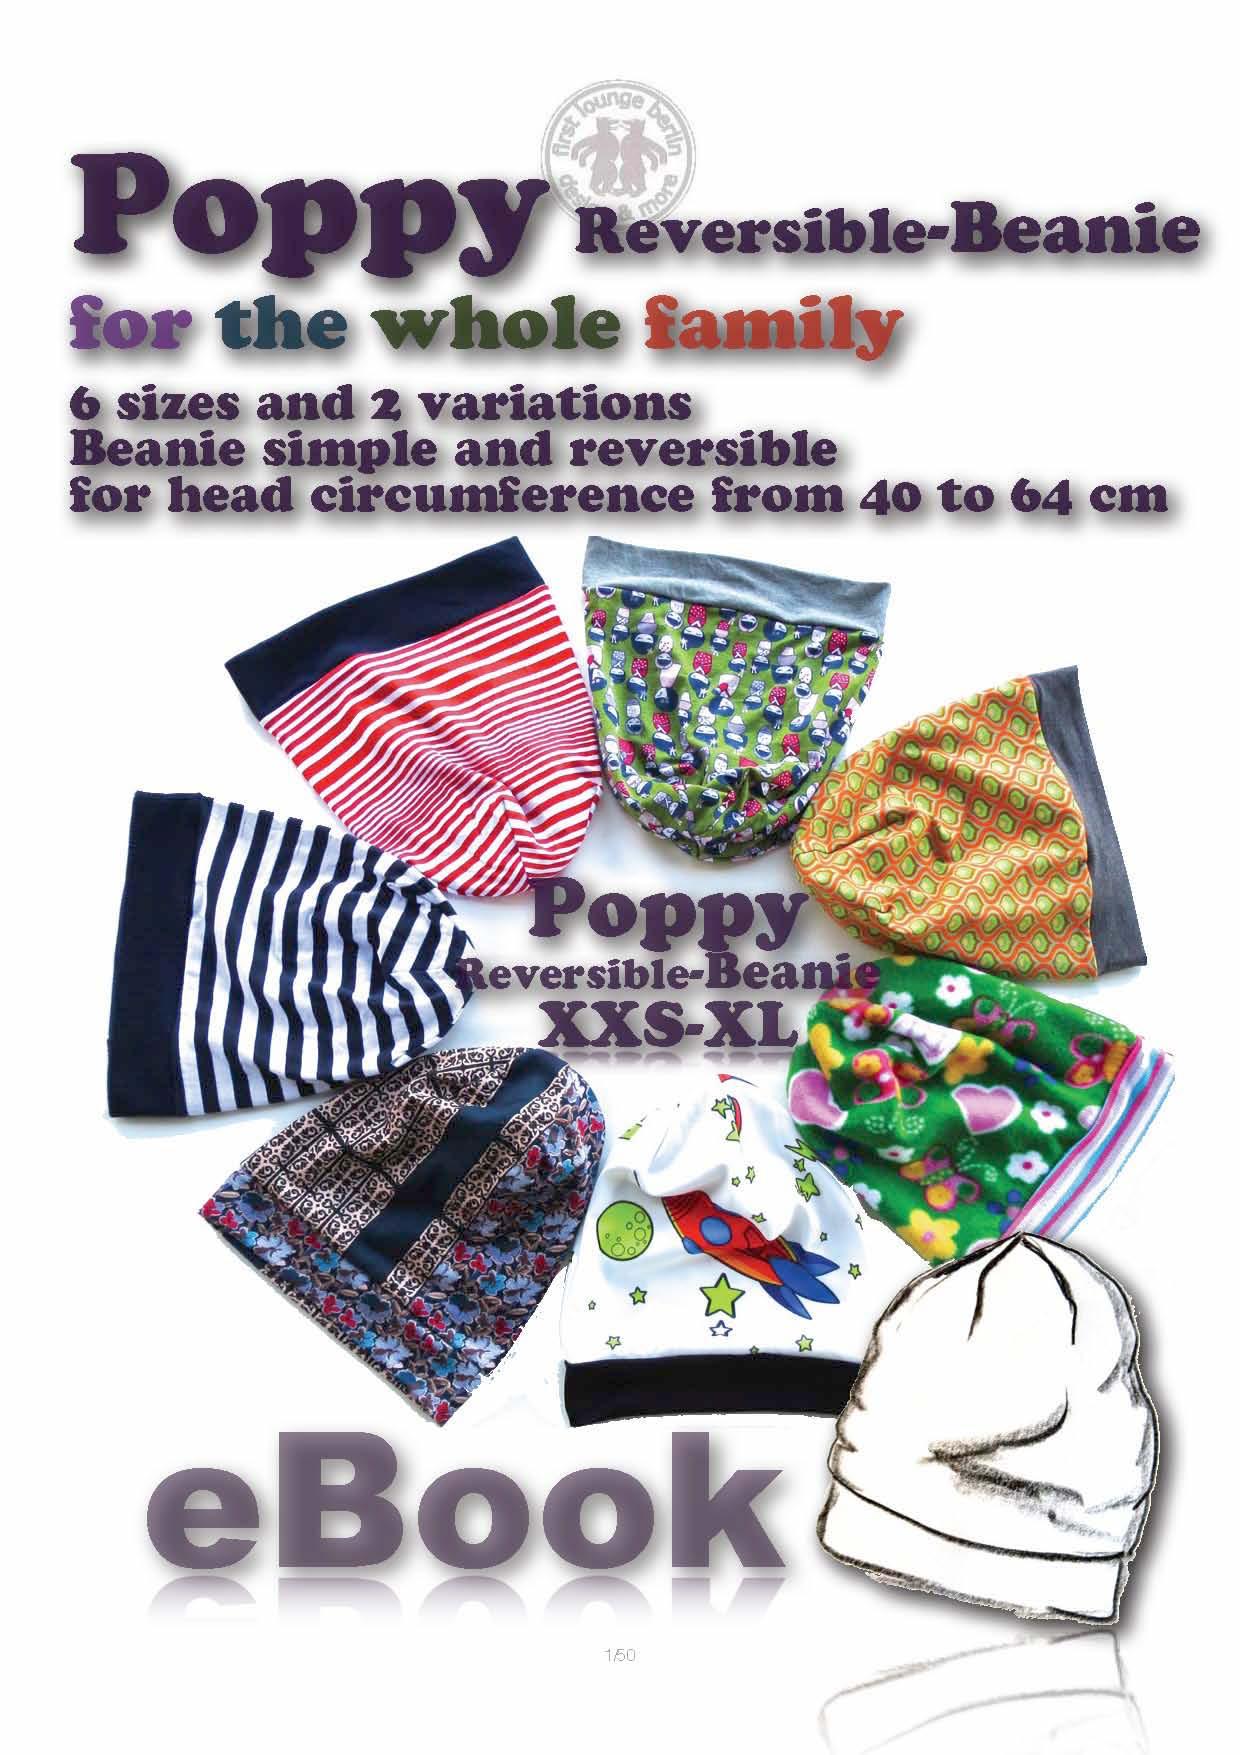 poppy-reversible-beanie-cap-6-sizes-xxs-xl-for-the-whole-family-download